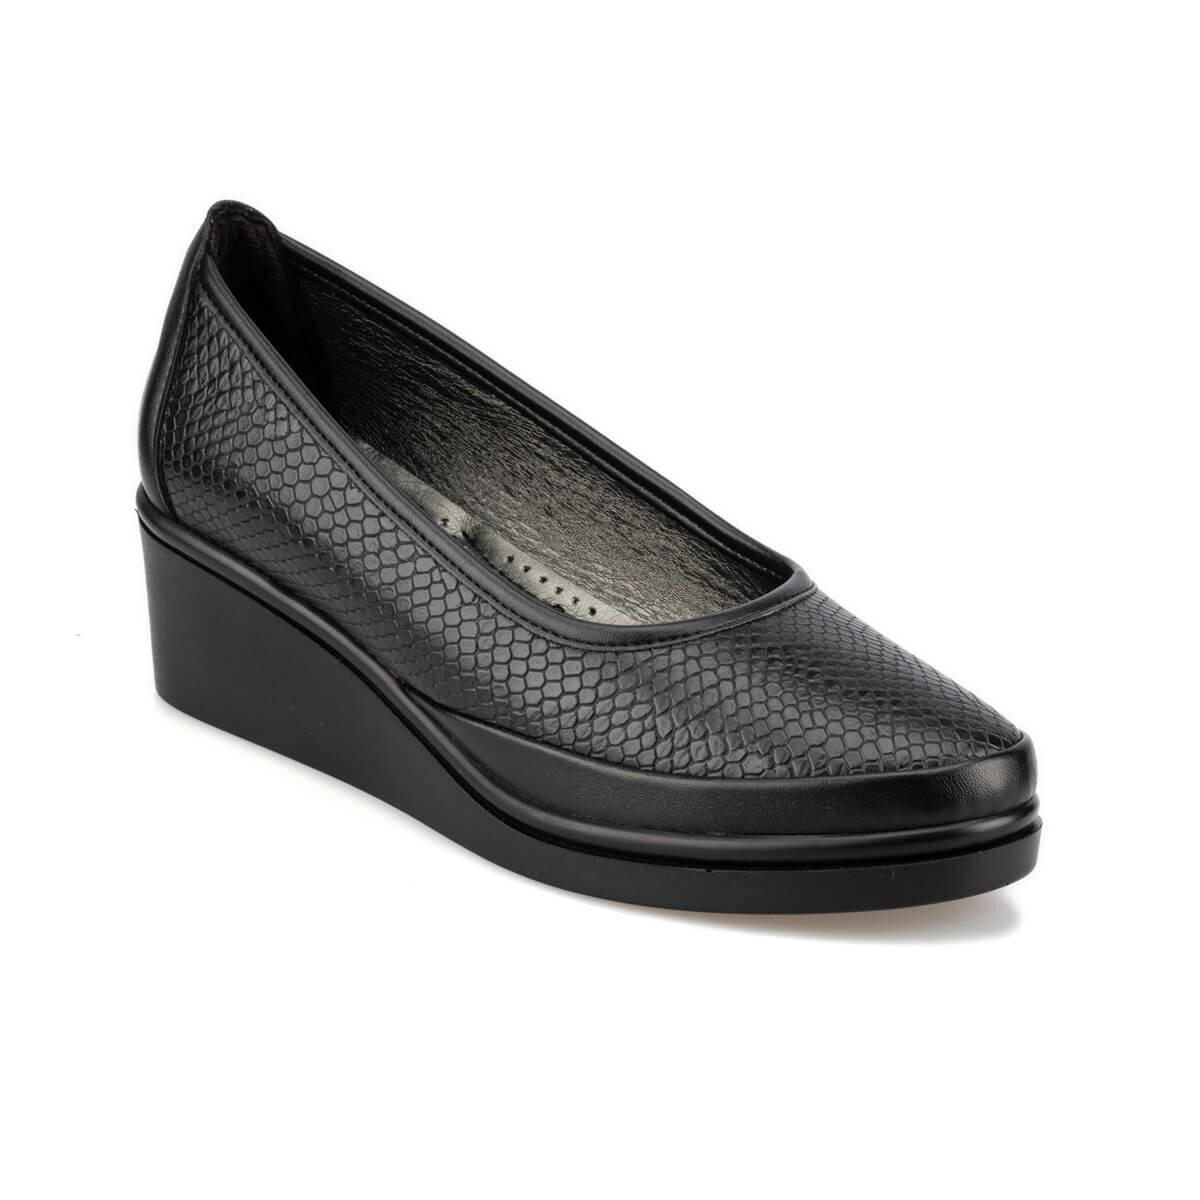 FLO 92.151038YZ Black Women 'S Wedges Shoes Polaris